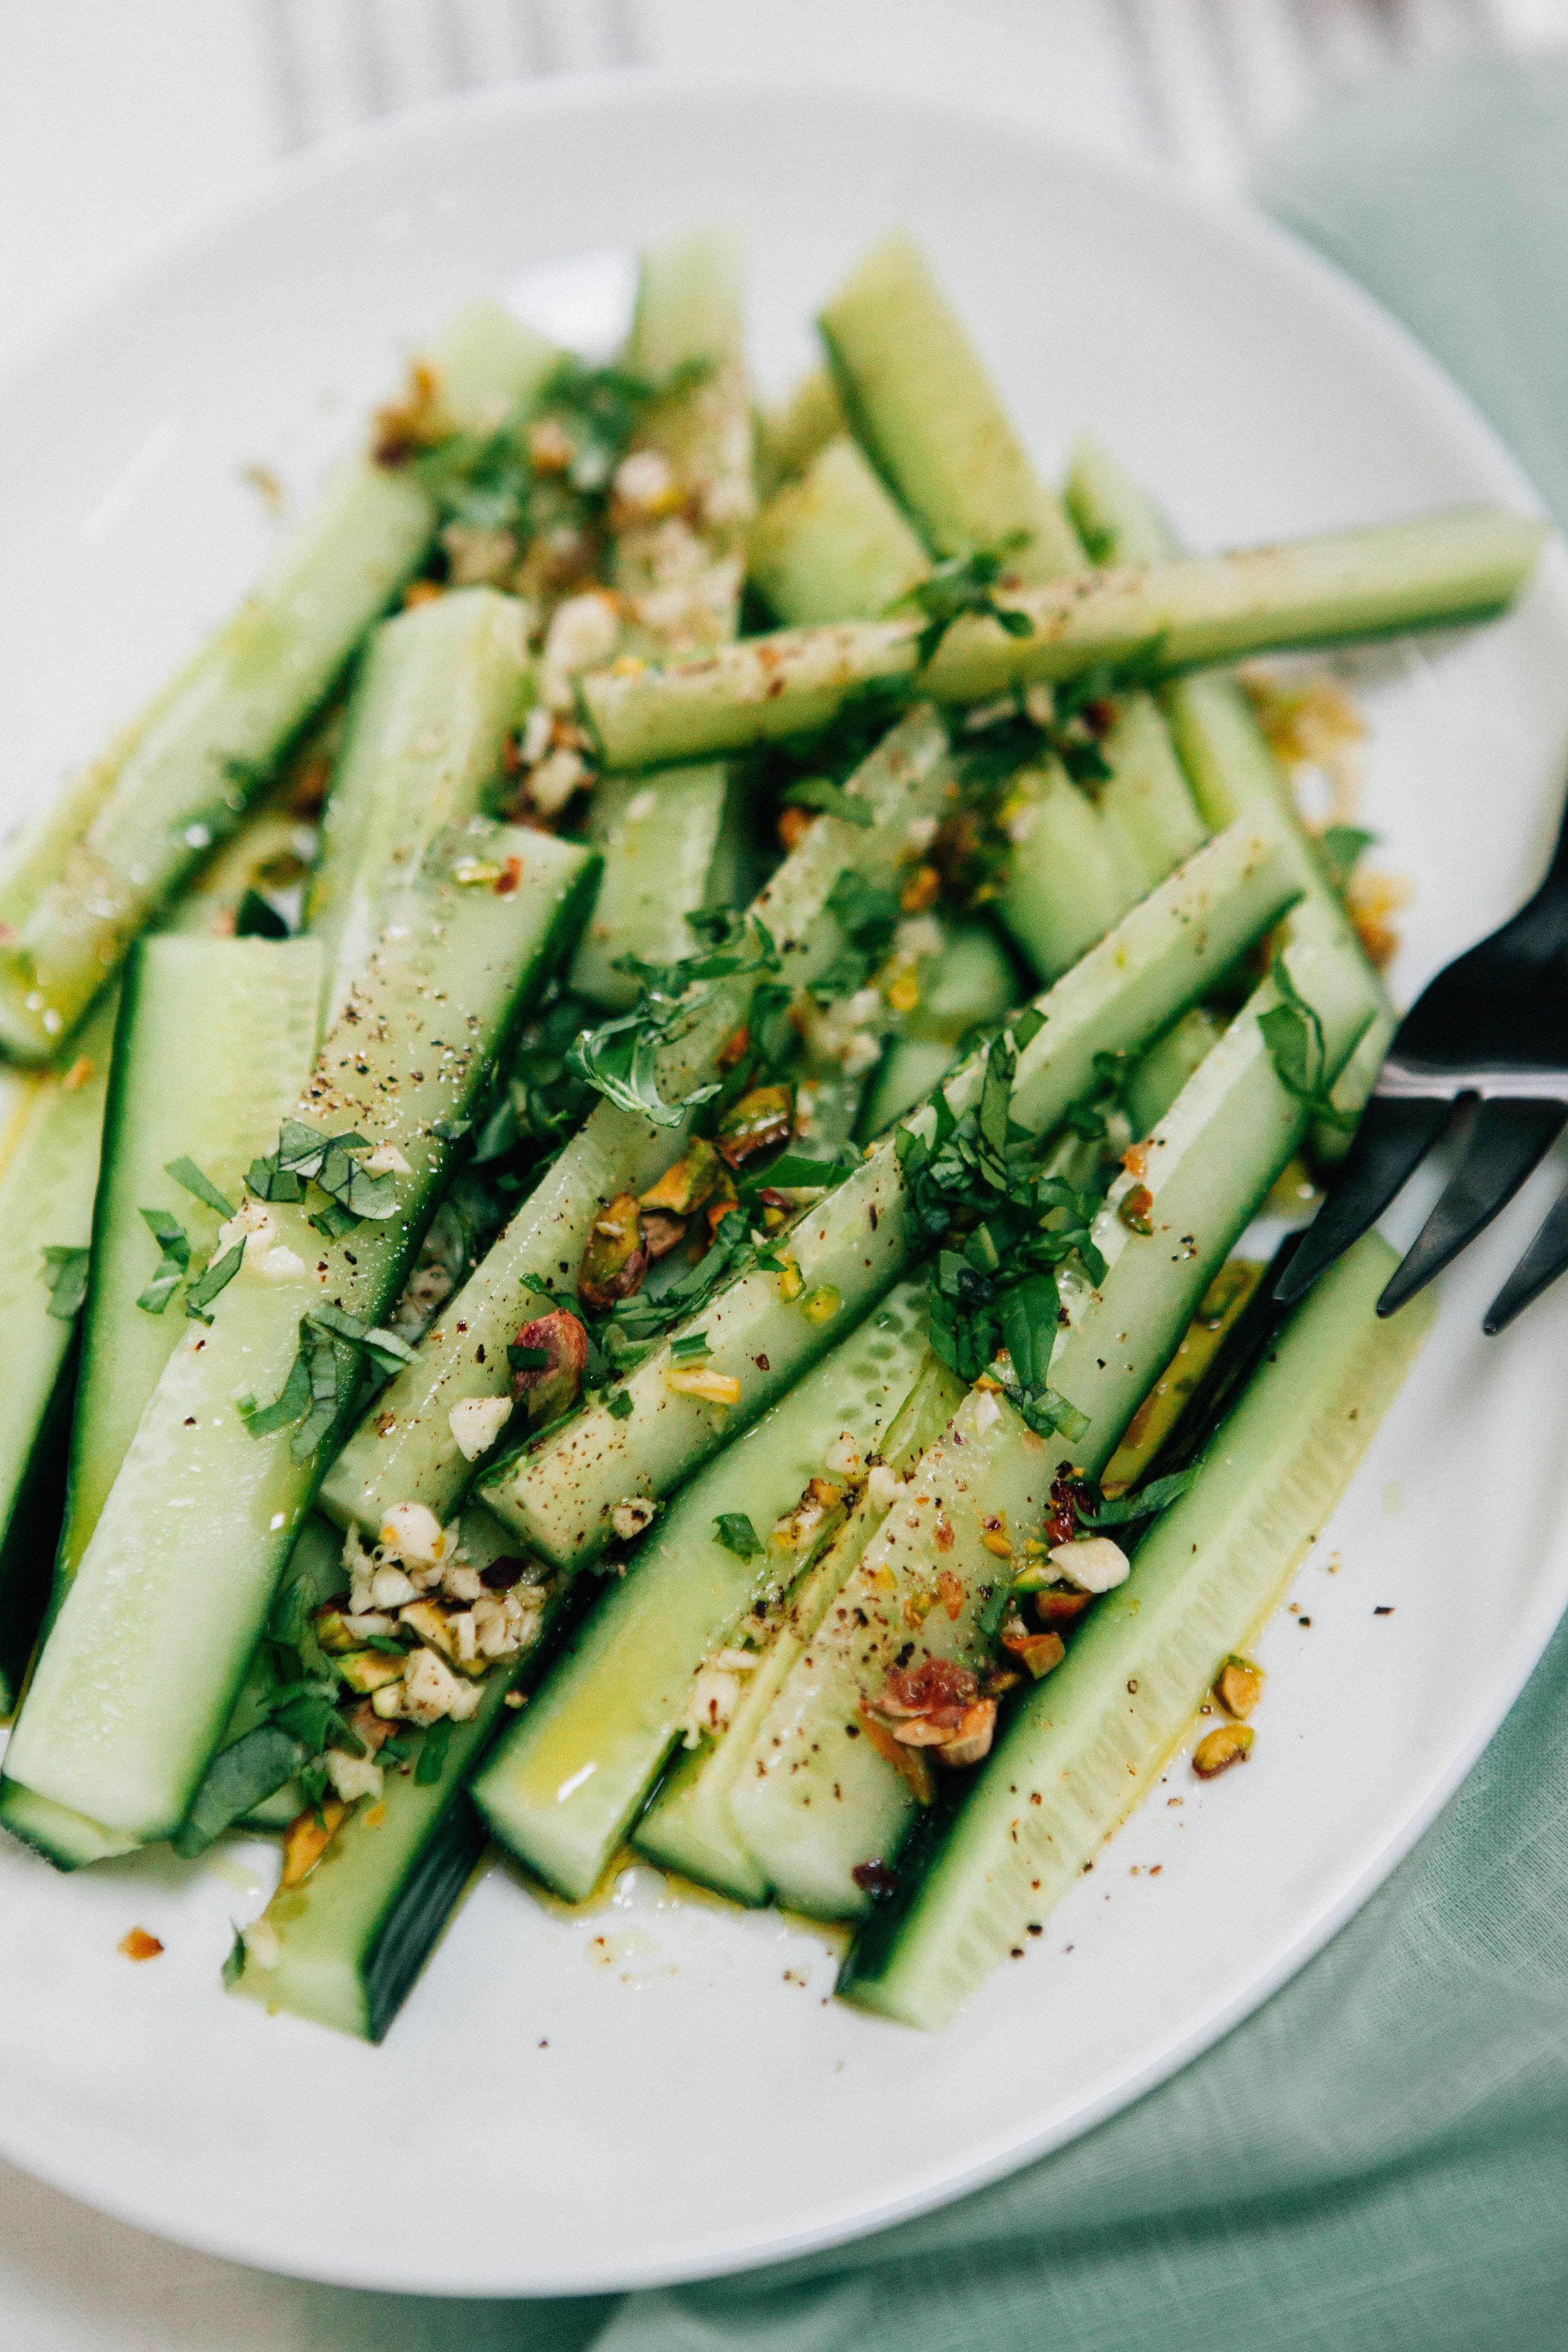 Goldmine_Recipes_Cucumbers-9.jpg